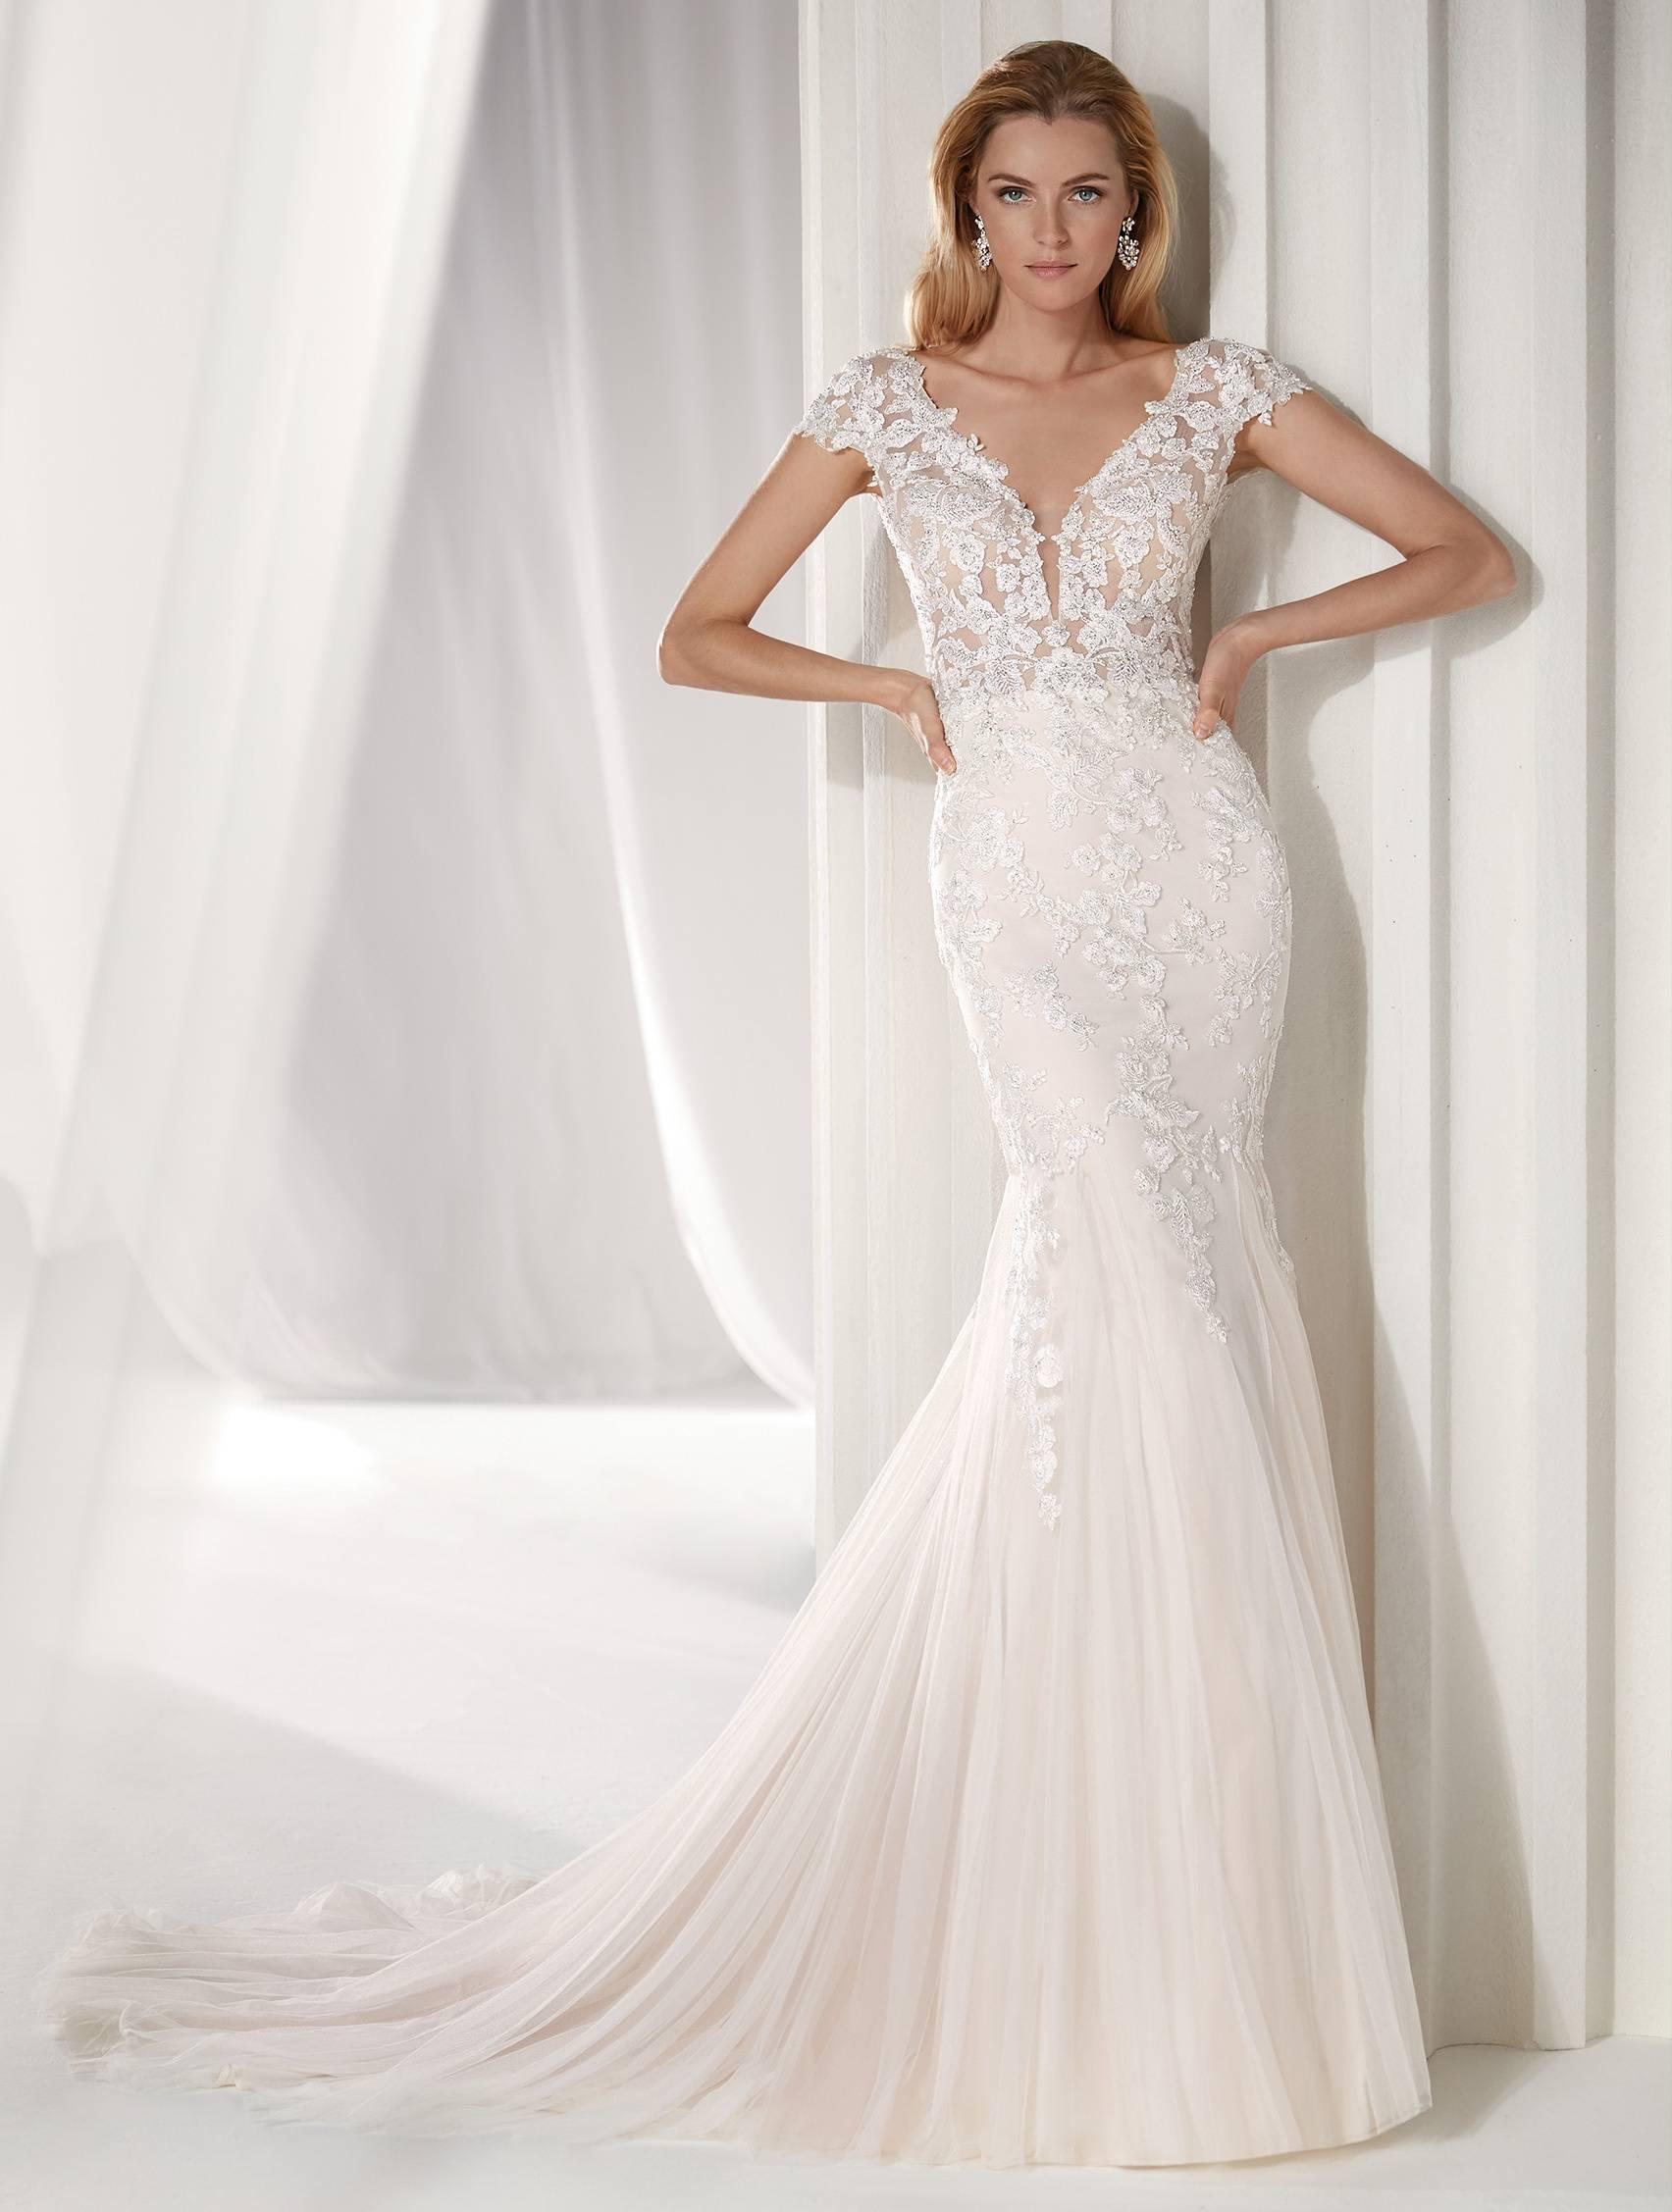 NICOLE MILANO NIA19028 WEDDING DRESS